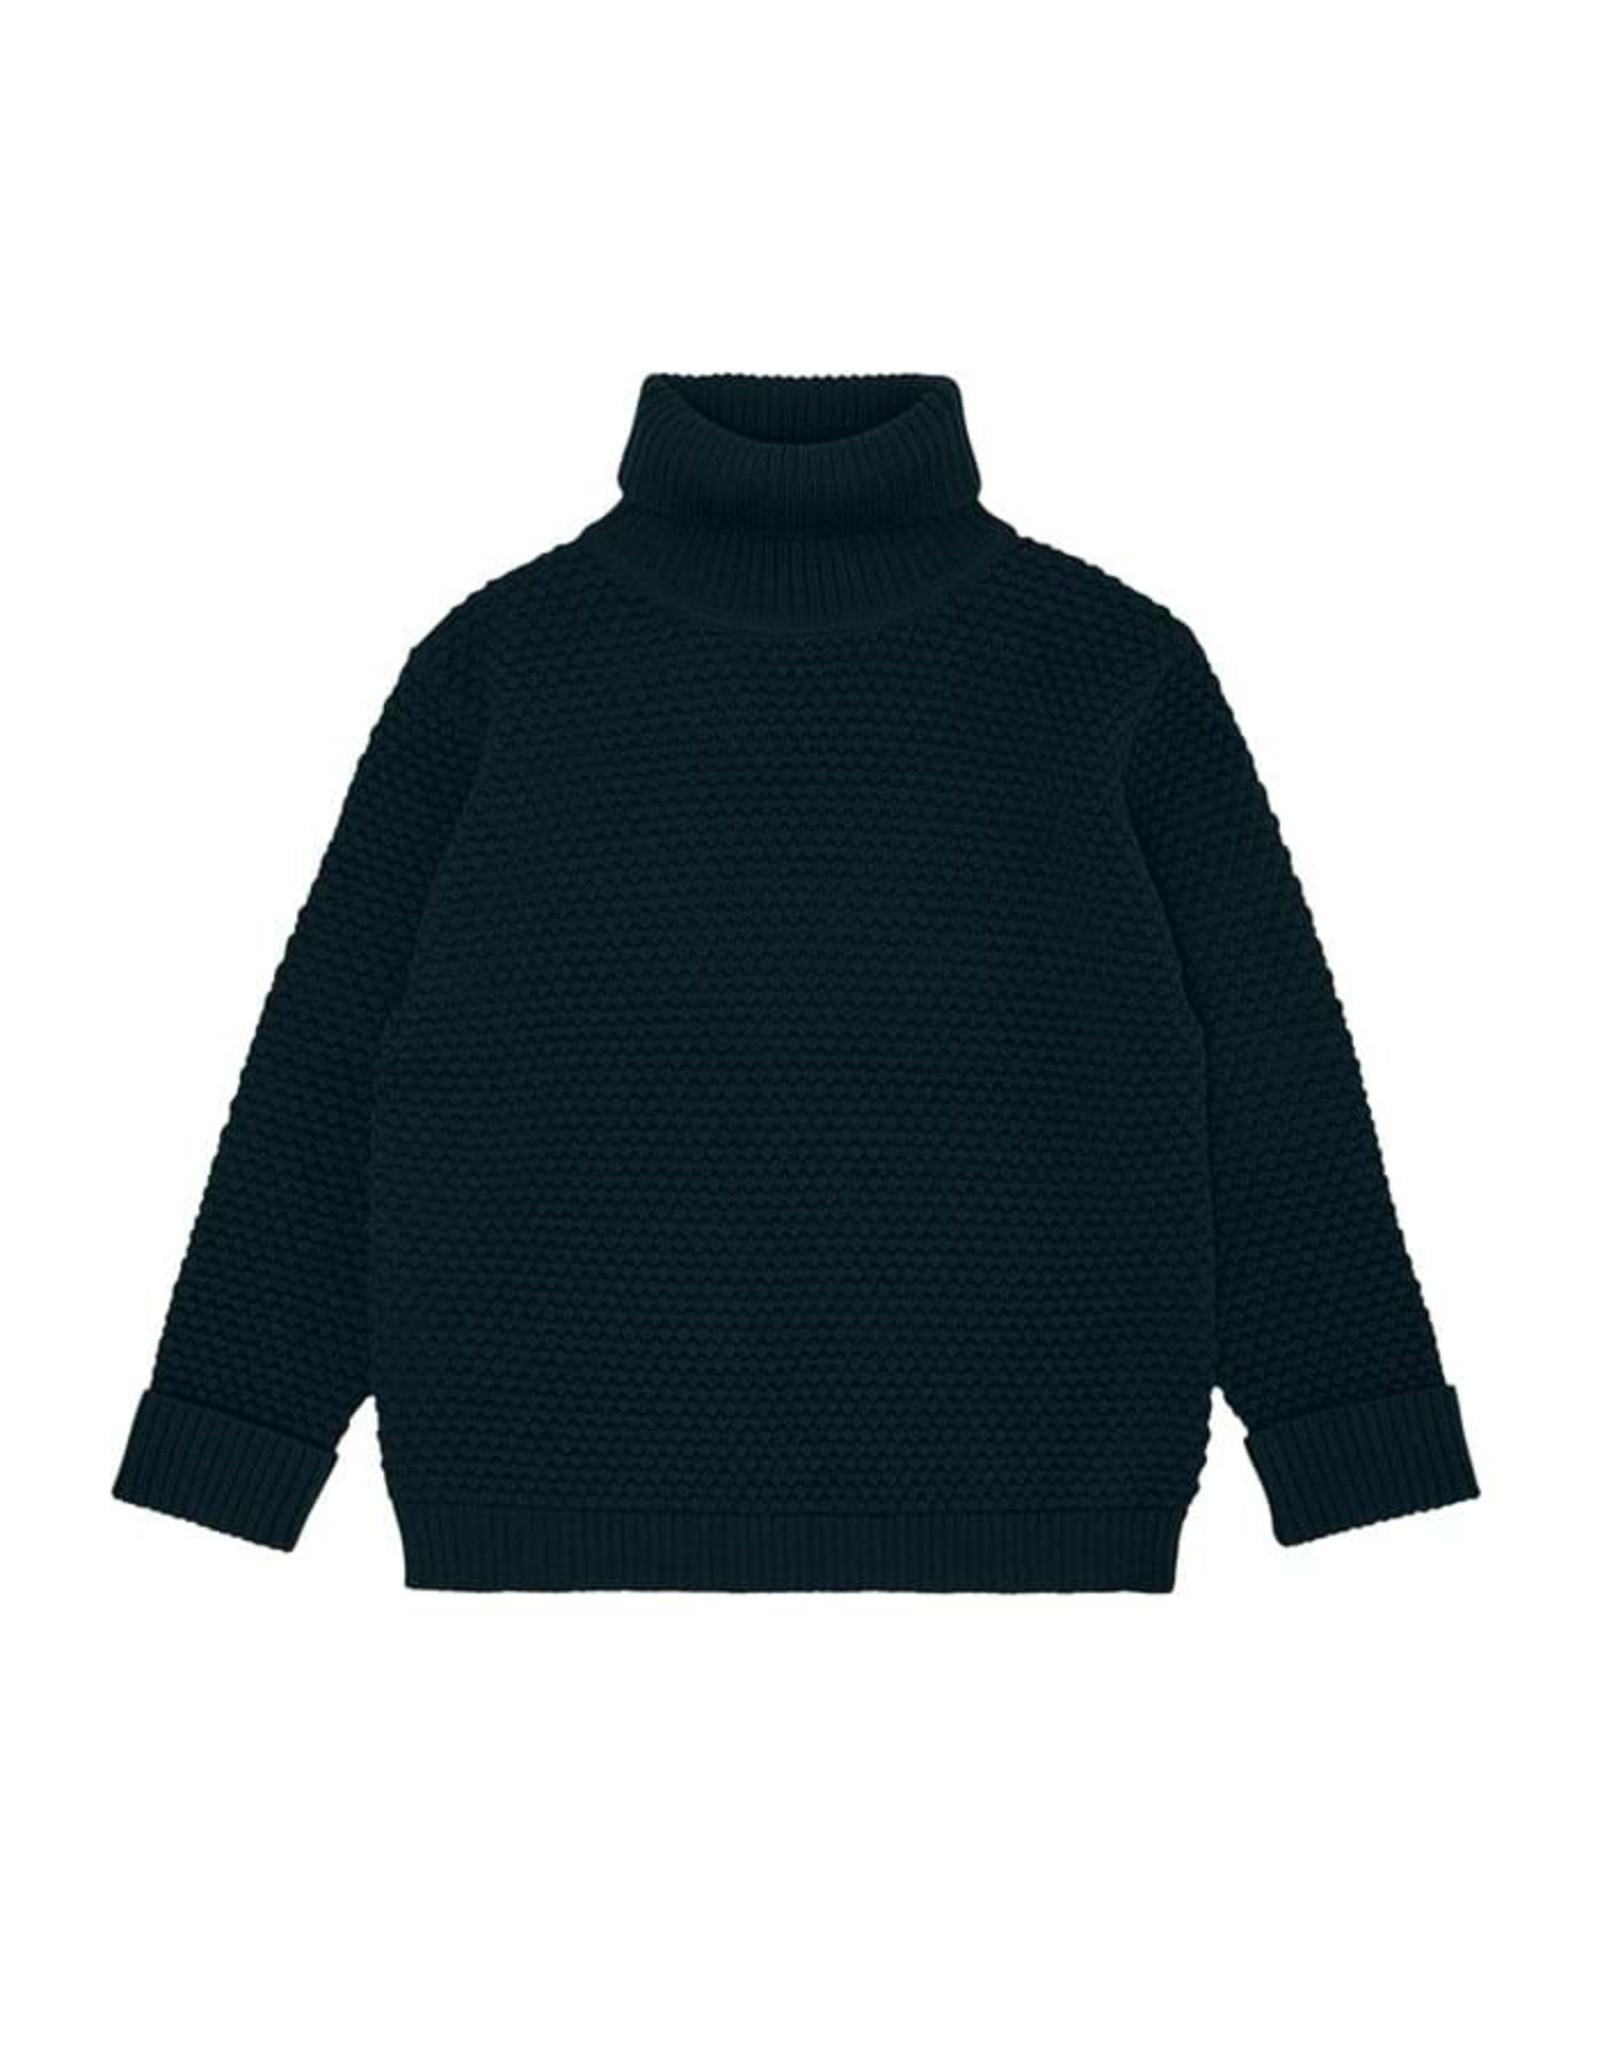 FUB FUB FW21 1621 Bubble Sweater